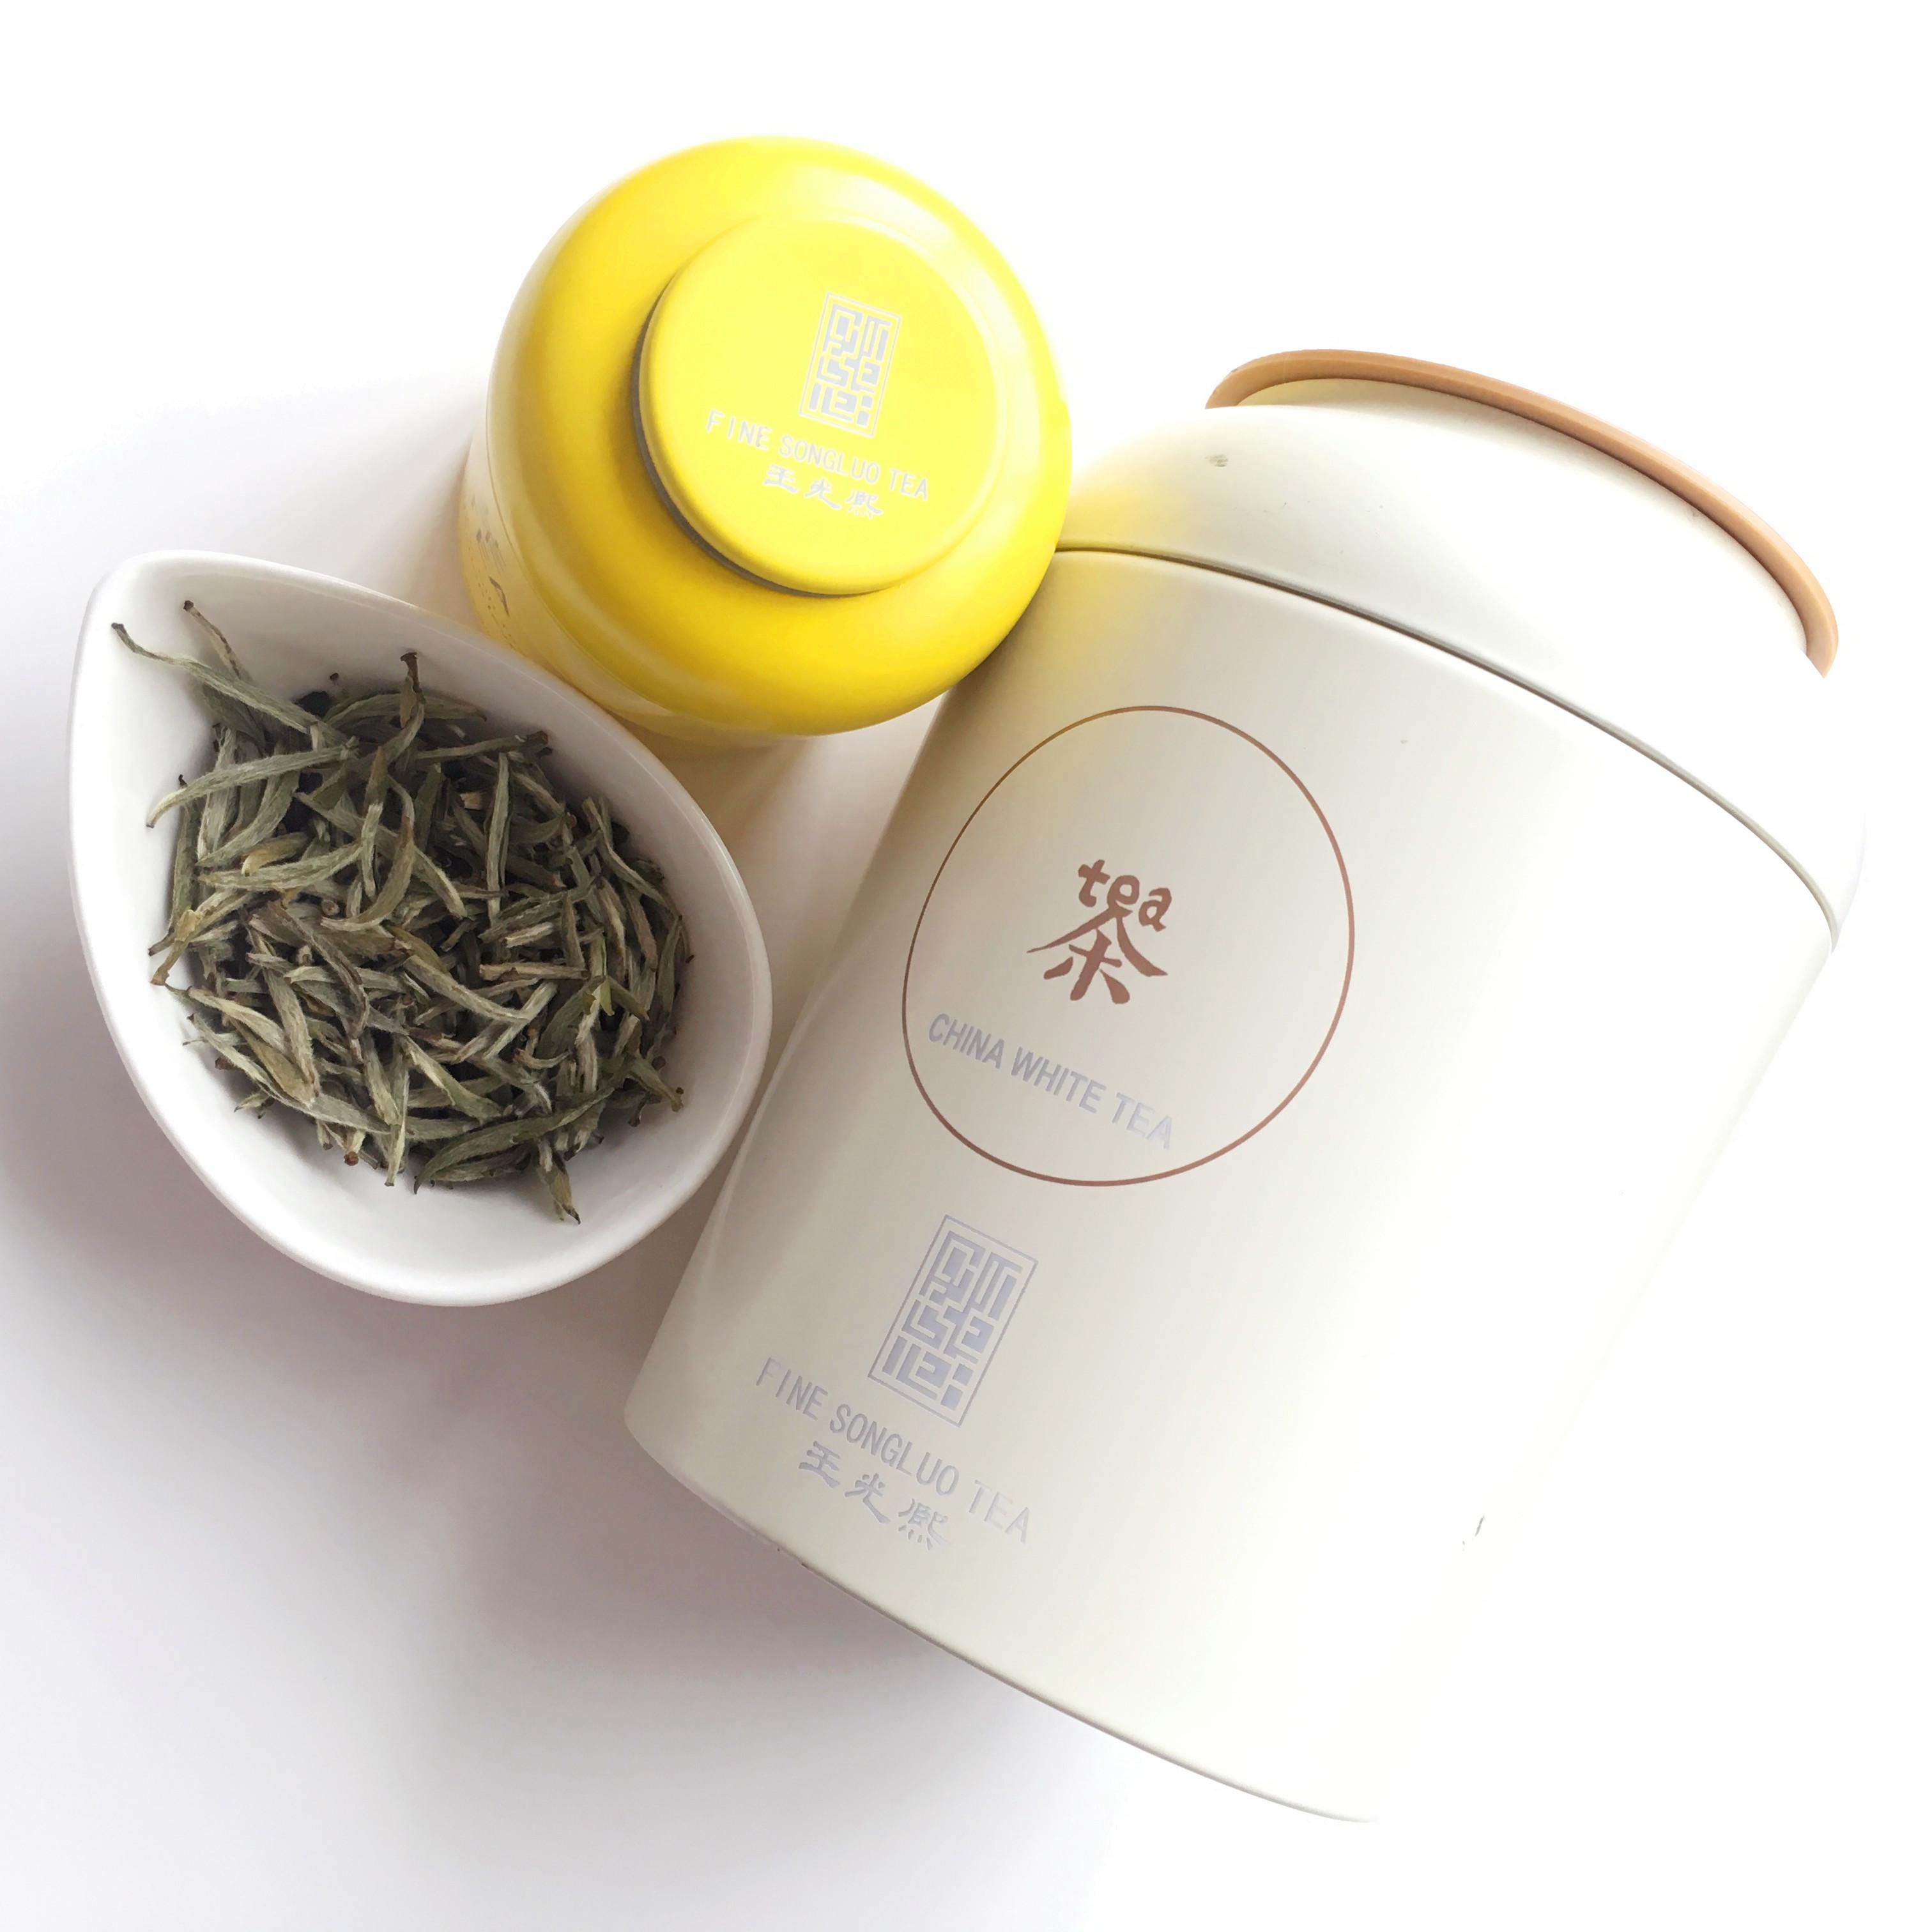 refined EU standard Sliver Needles bai hao yinzhen white tea - 4uTea | 4uTea.com